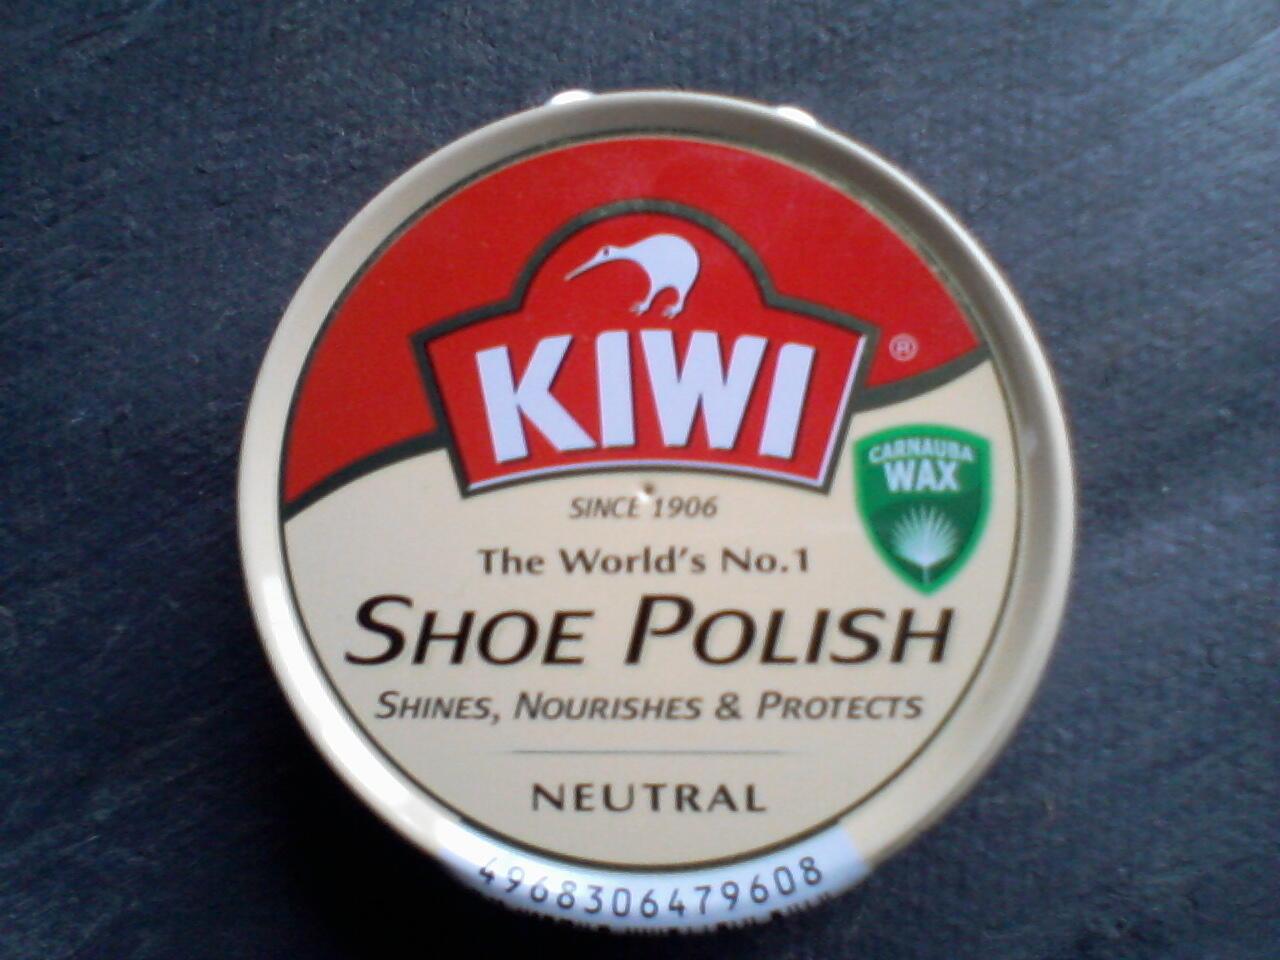 Terjual Mink Oil Leather Cleaner Semir Netral Neutral Polish Untuk Sepatu Kulit Shoe Dr Martens Murah Gan